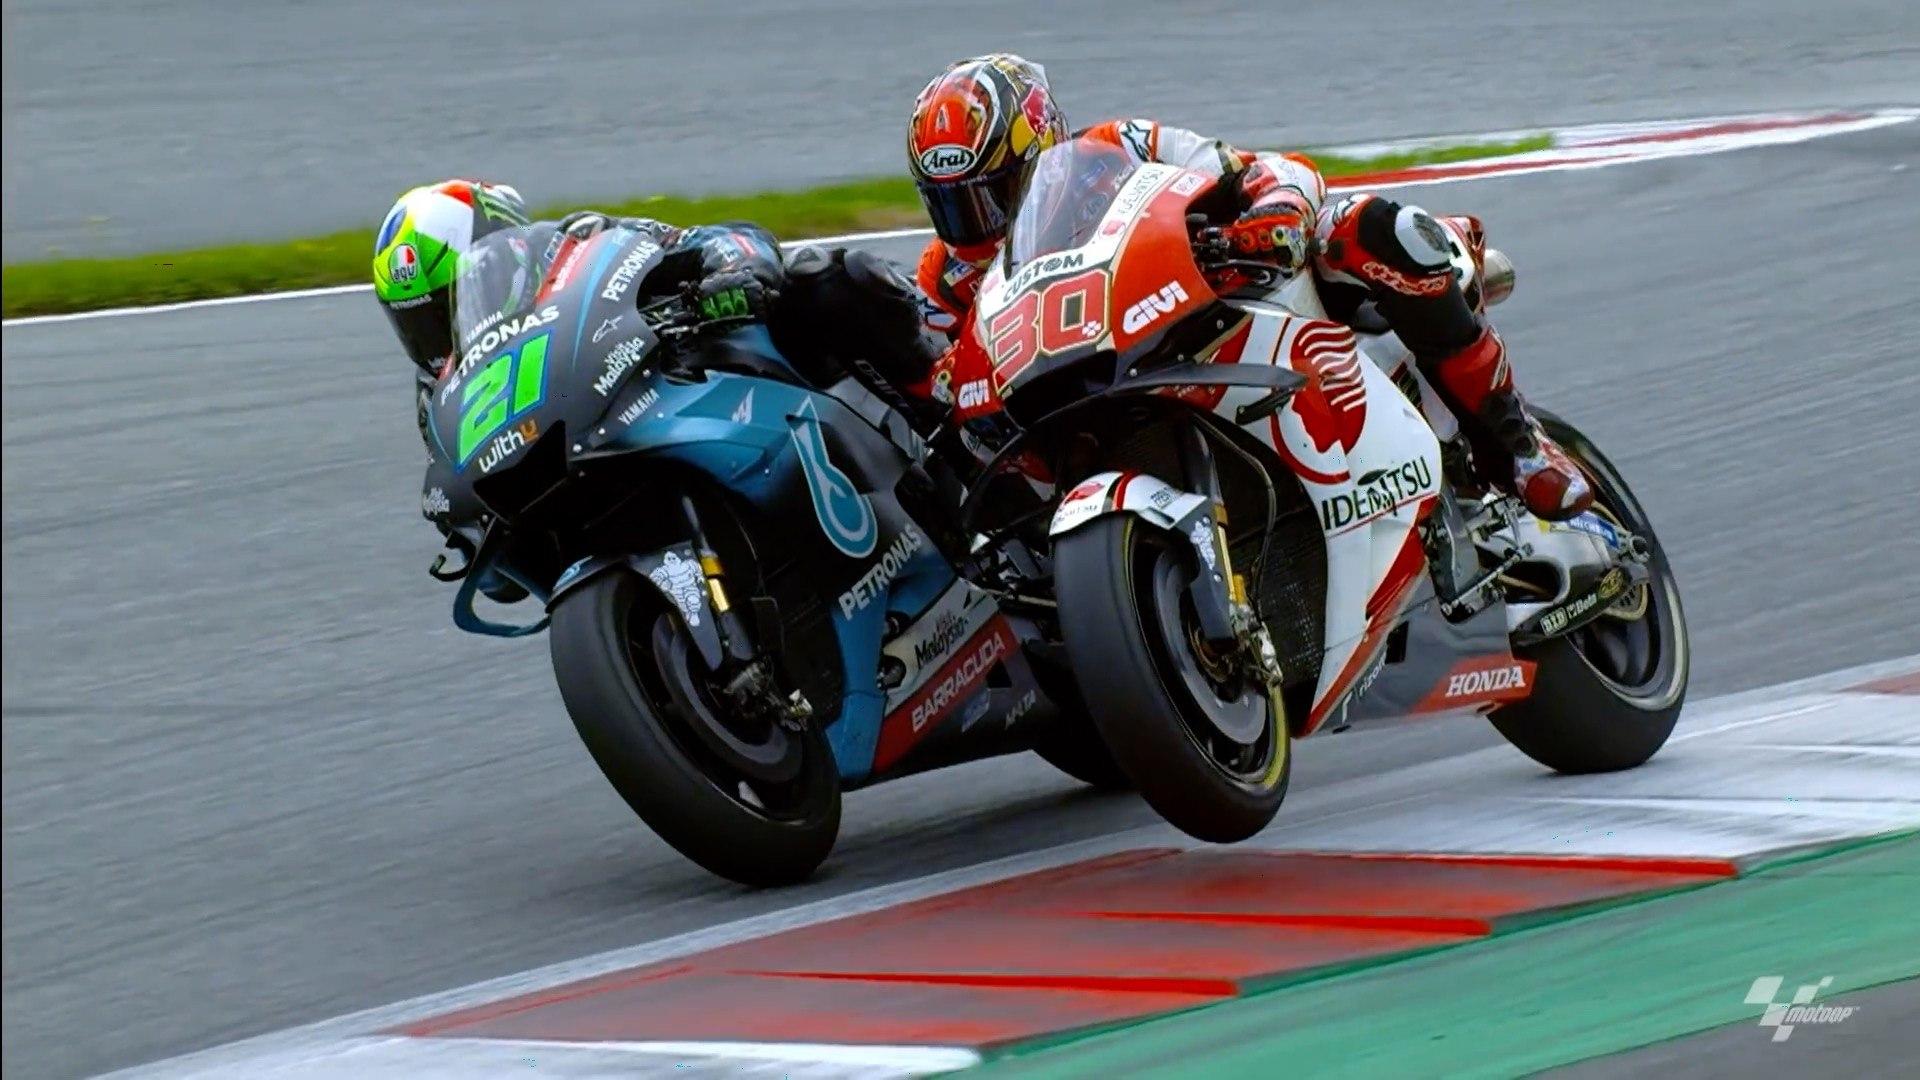 MotoGP 21 - Announcement Trailer - video Dailymotion